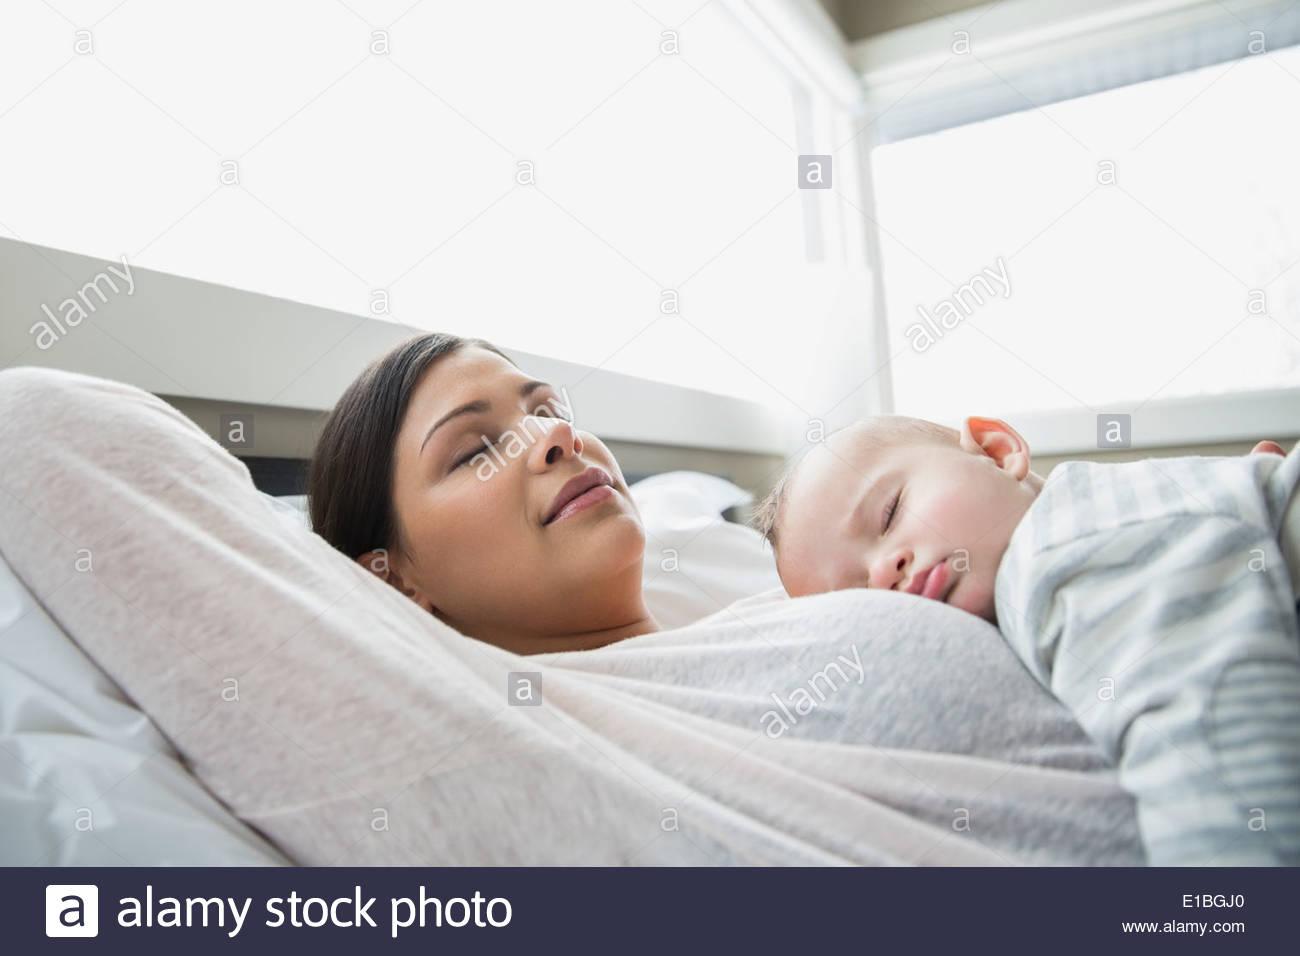 Serene mother and baby sleeping - Stock Image